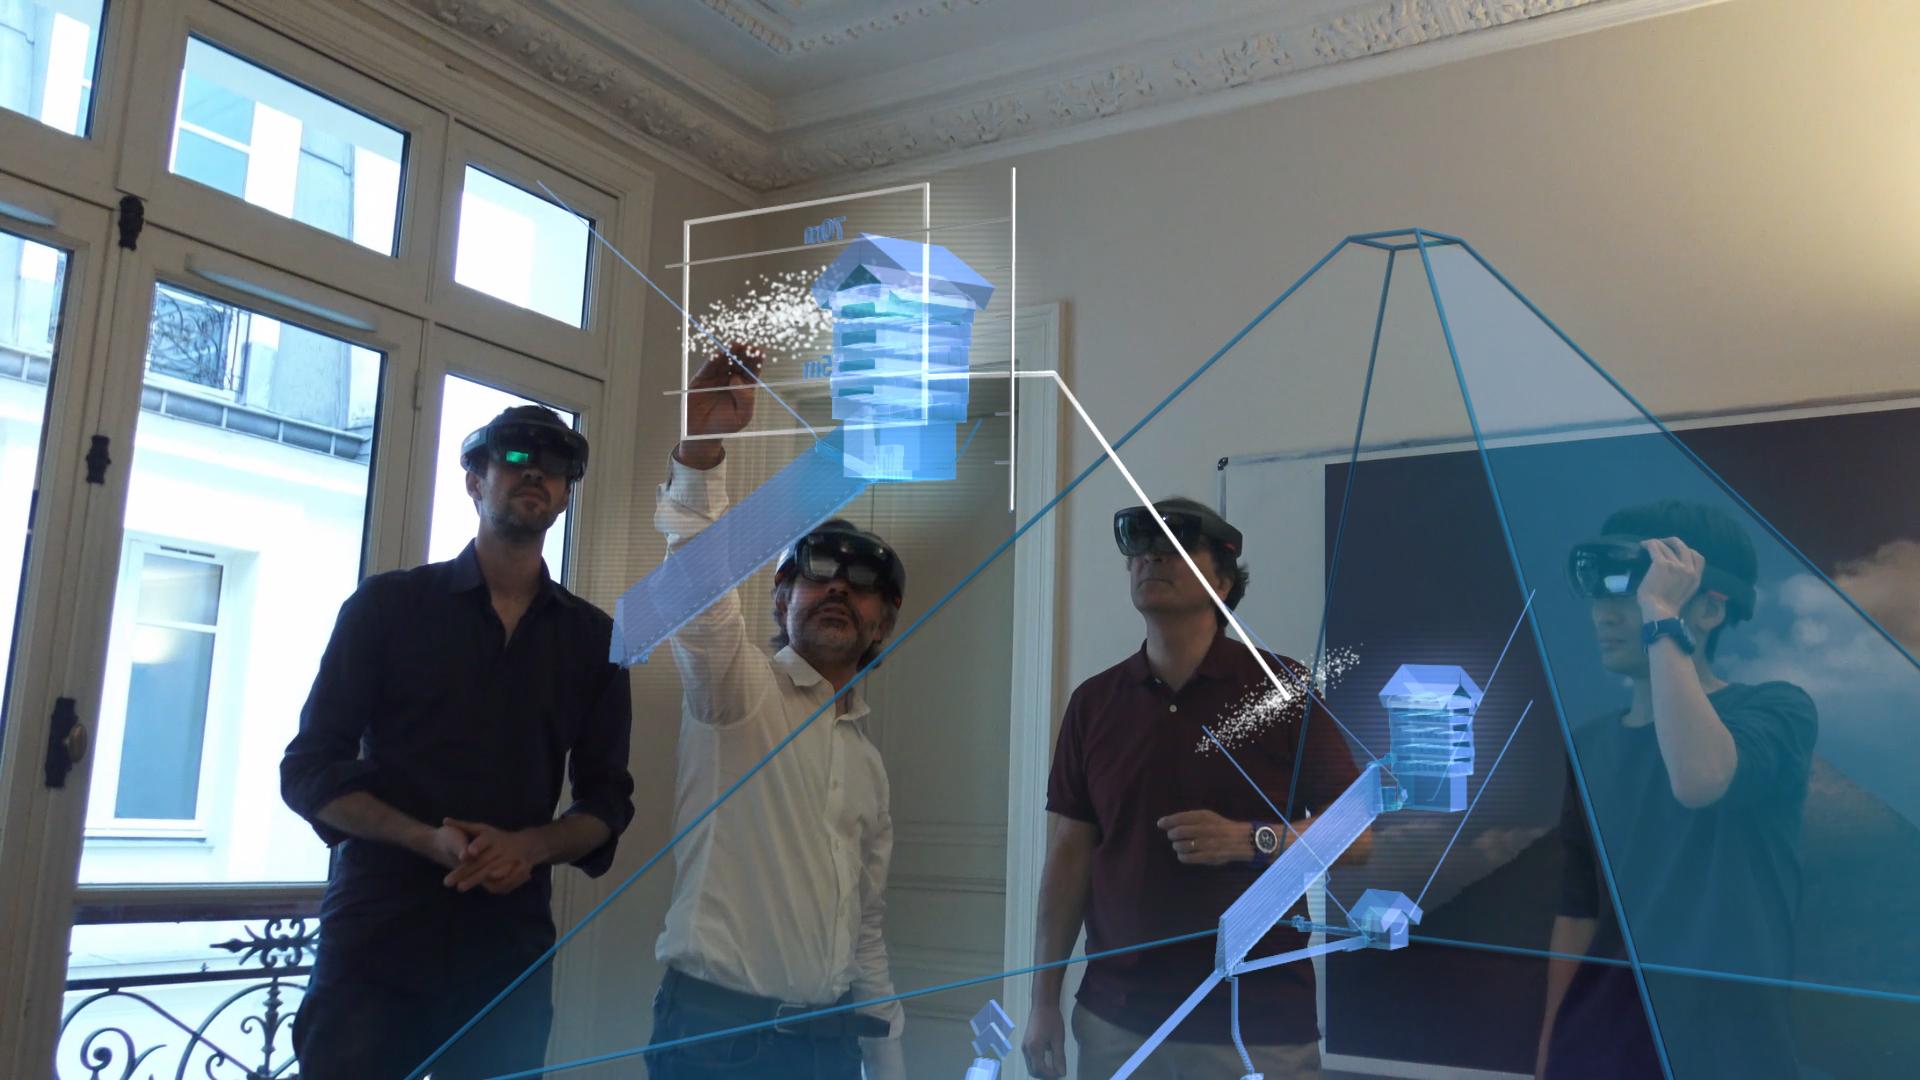 Investigadores a usar tecnologia de realidade virtual para visualizar o interior da Pirâmide de Gizé, no Egipto.